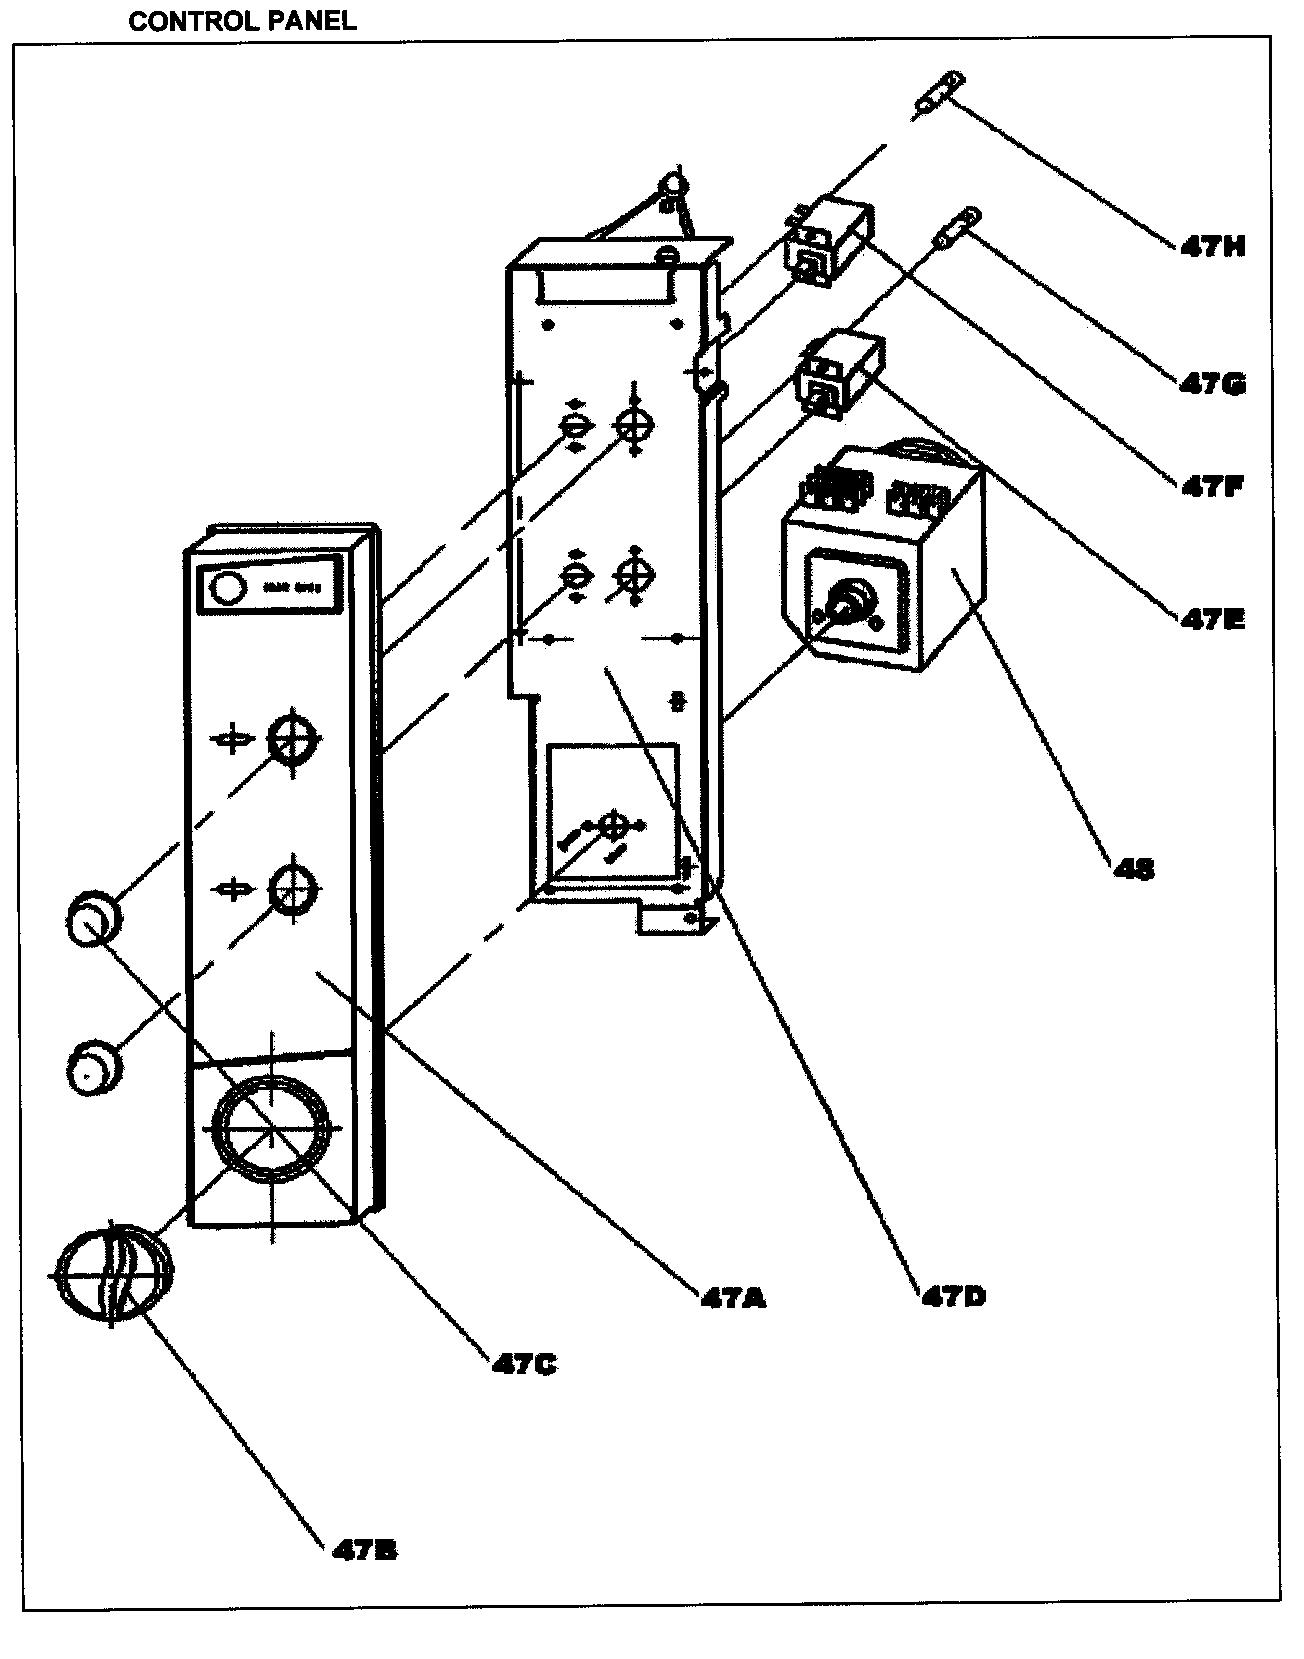 CONTROL PANEL Diagram & Parts List for Model ddw396w Danby